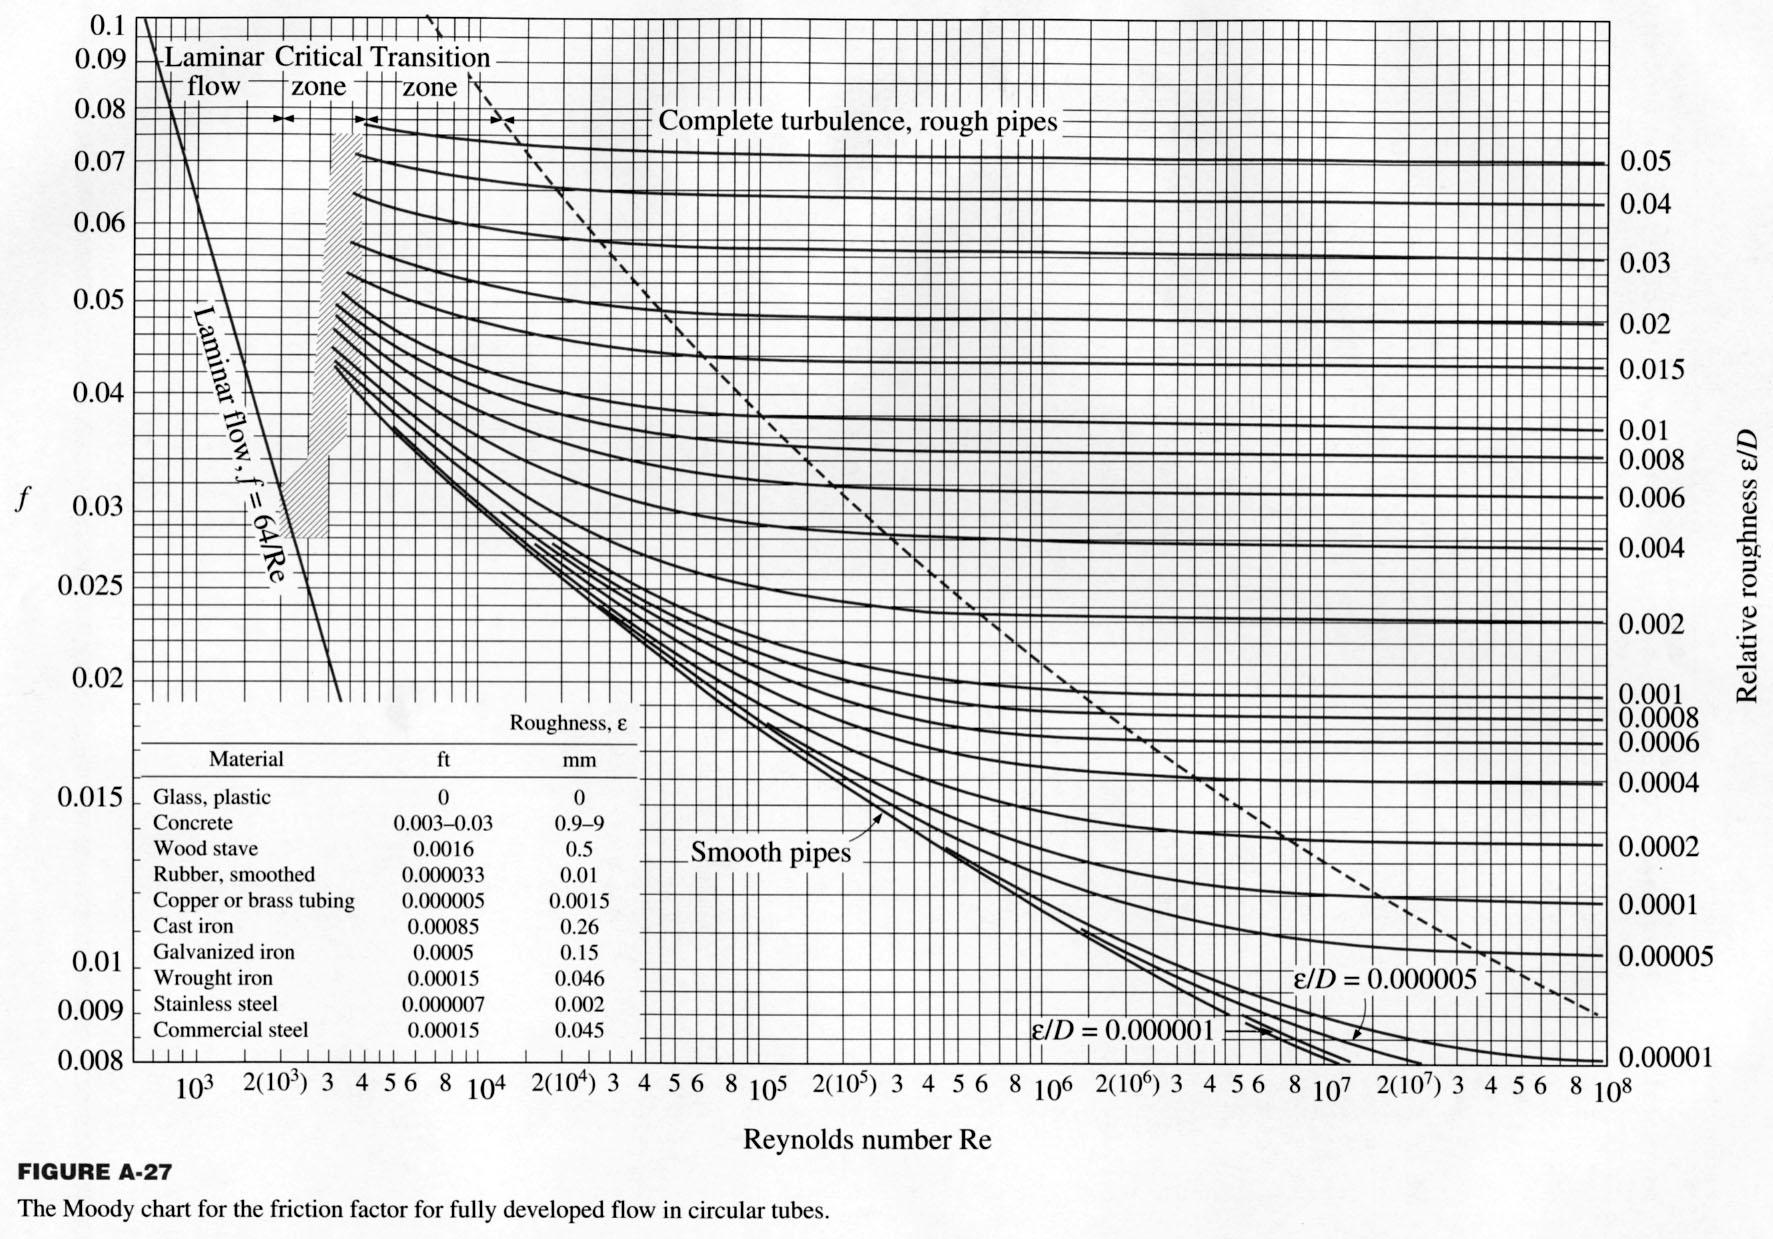 poisson loss function table pdf